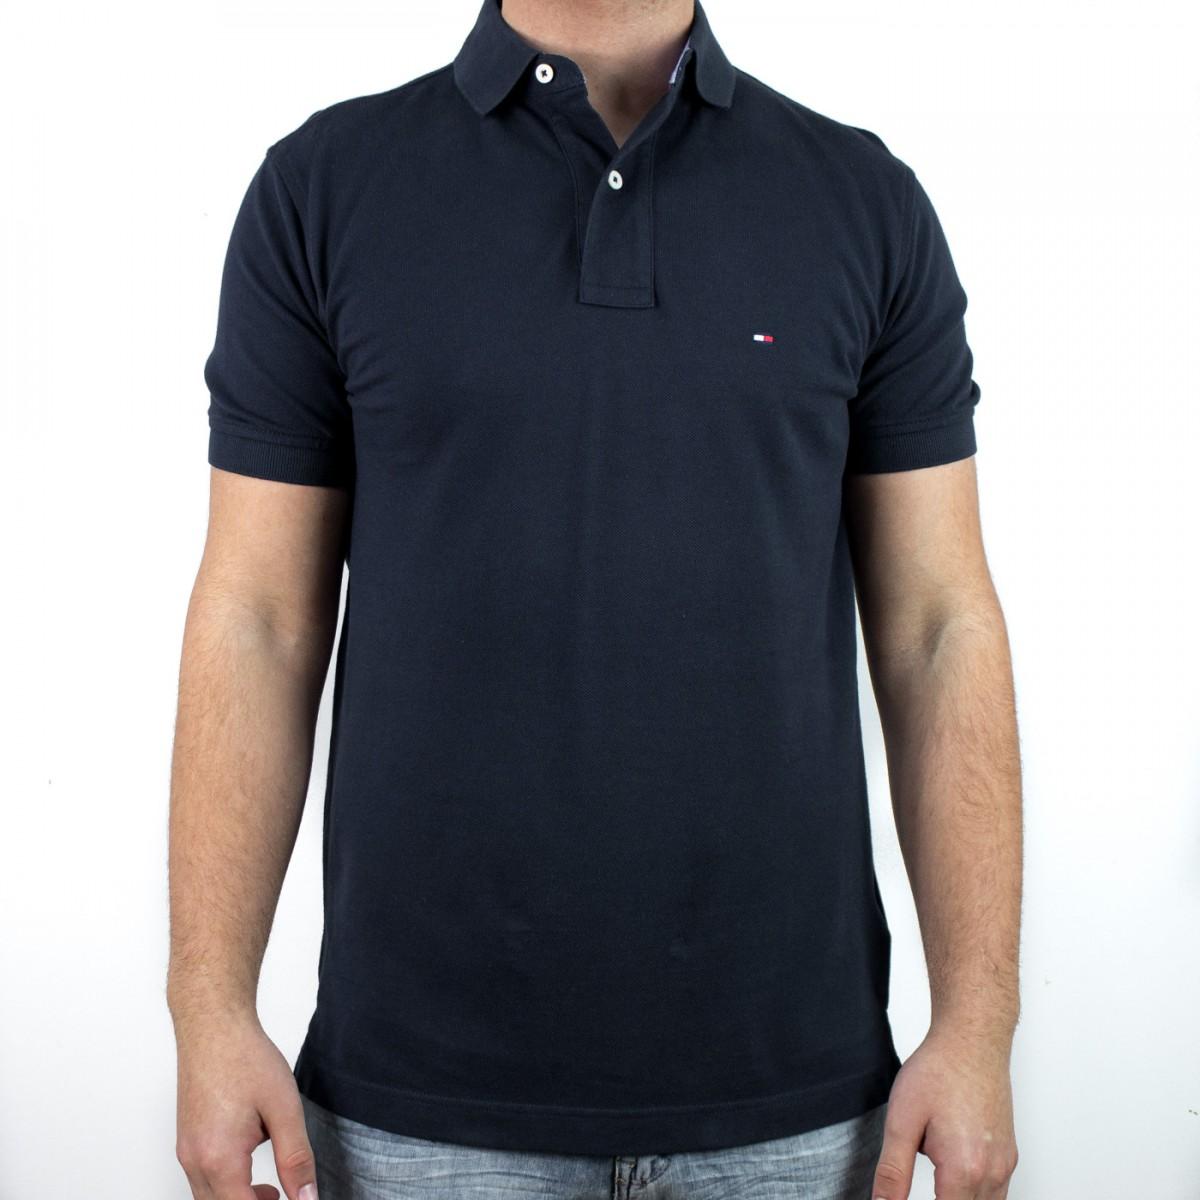 Bizz Store - Camisa Polo Masculina Tommy Hilfiger Manga Curta a0e8a51b81483